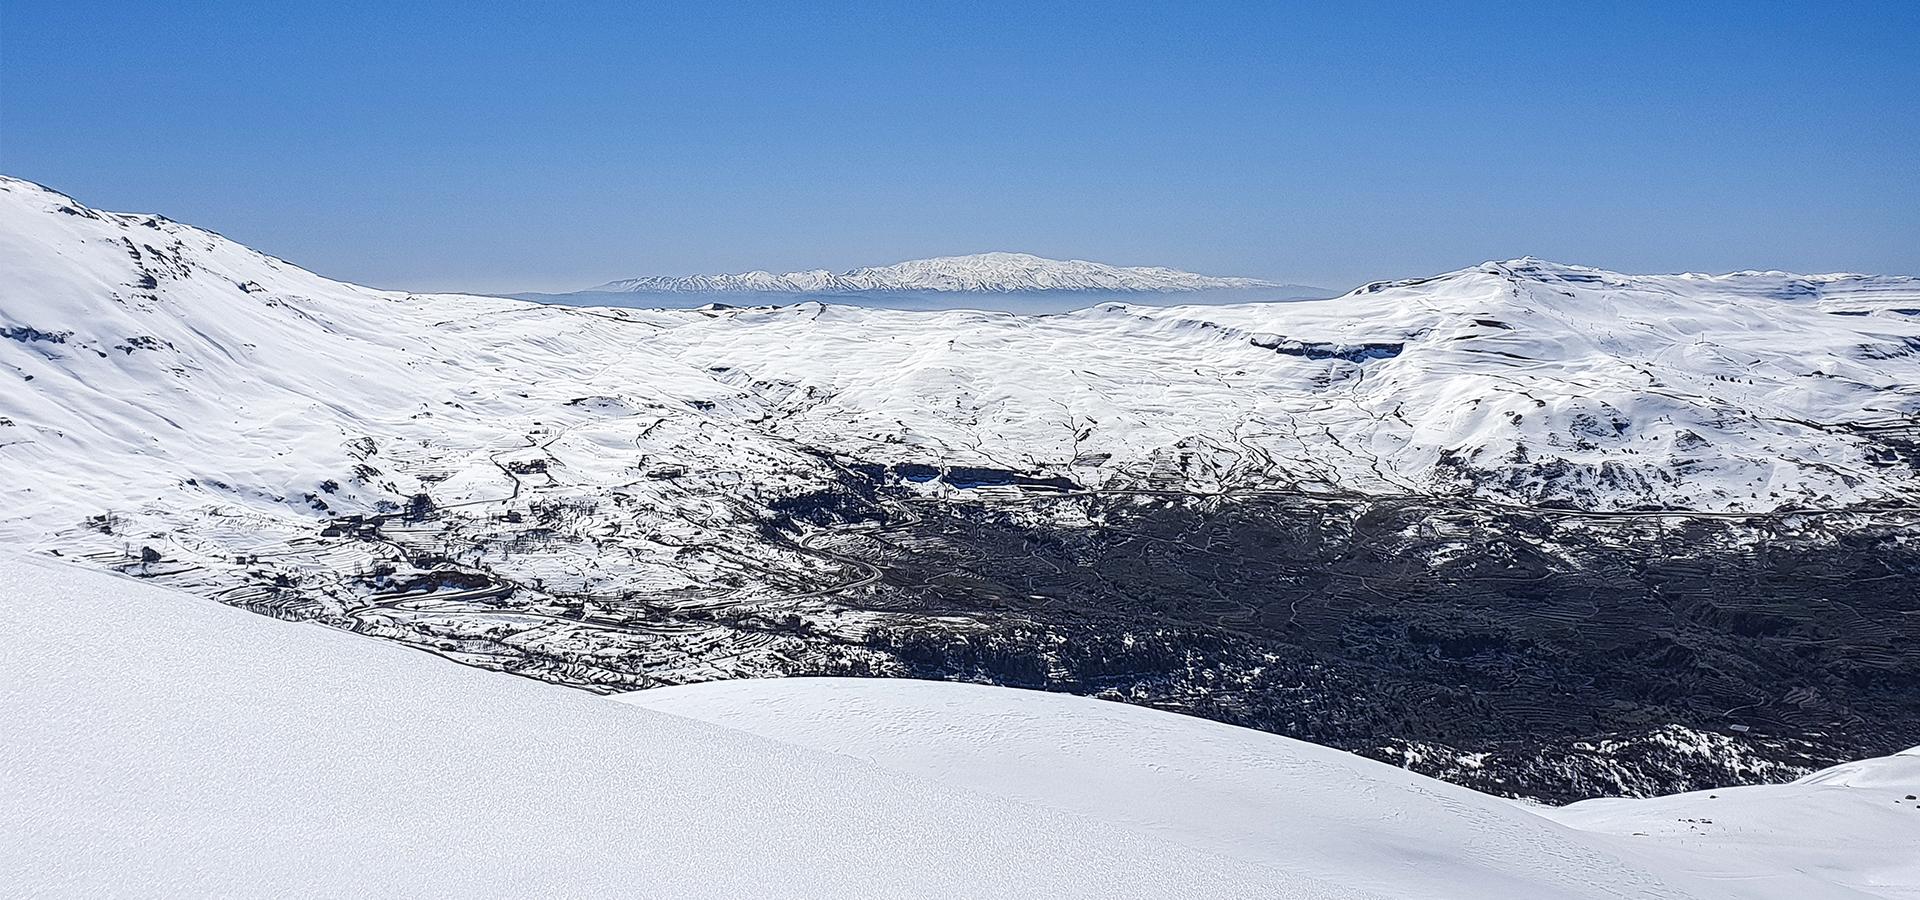 Mt Hermon from Sannine - Mario Fares